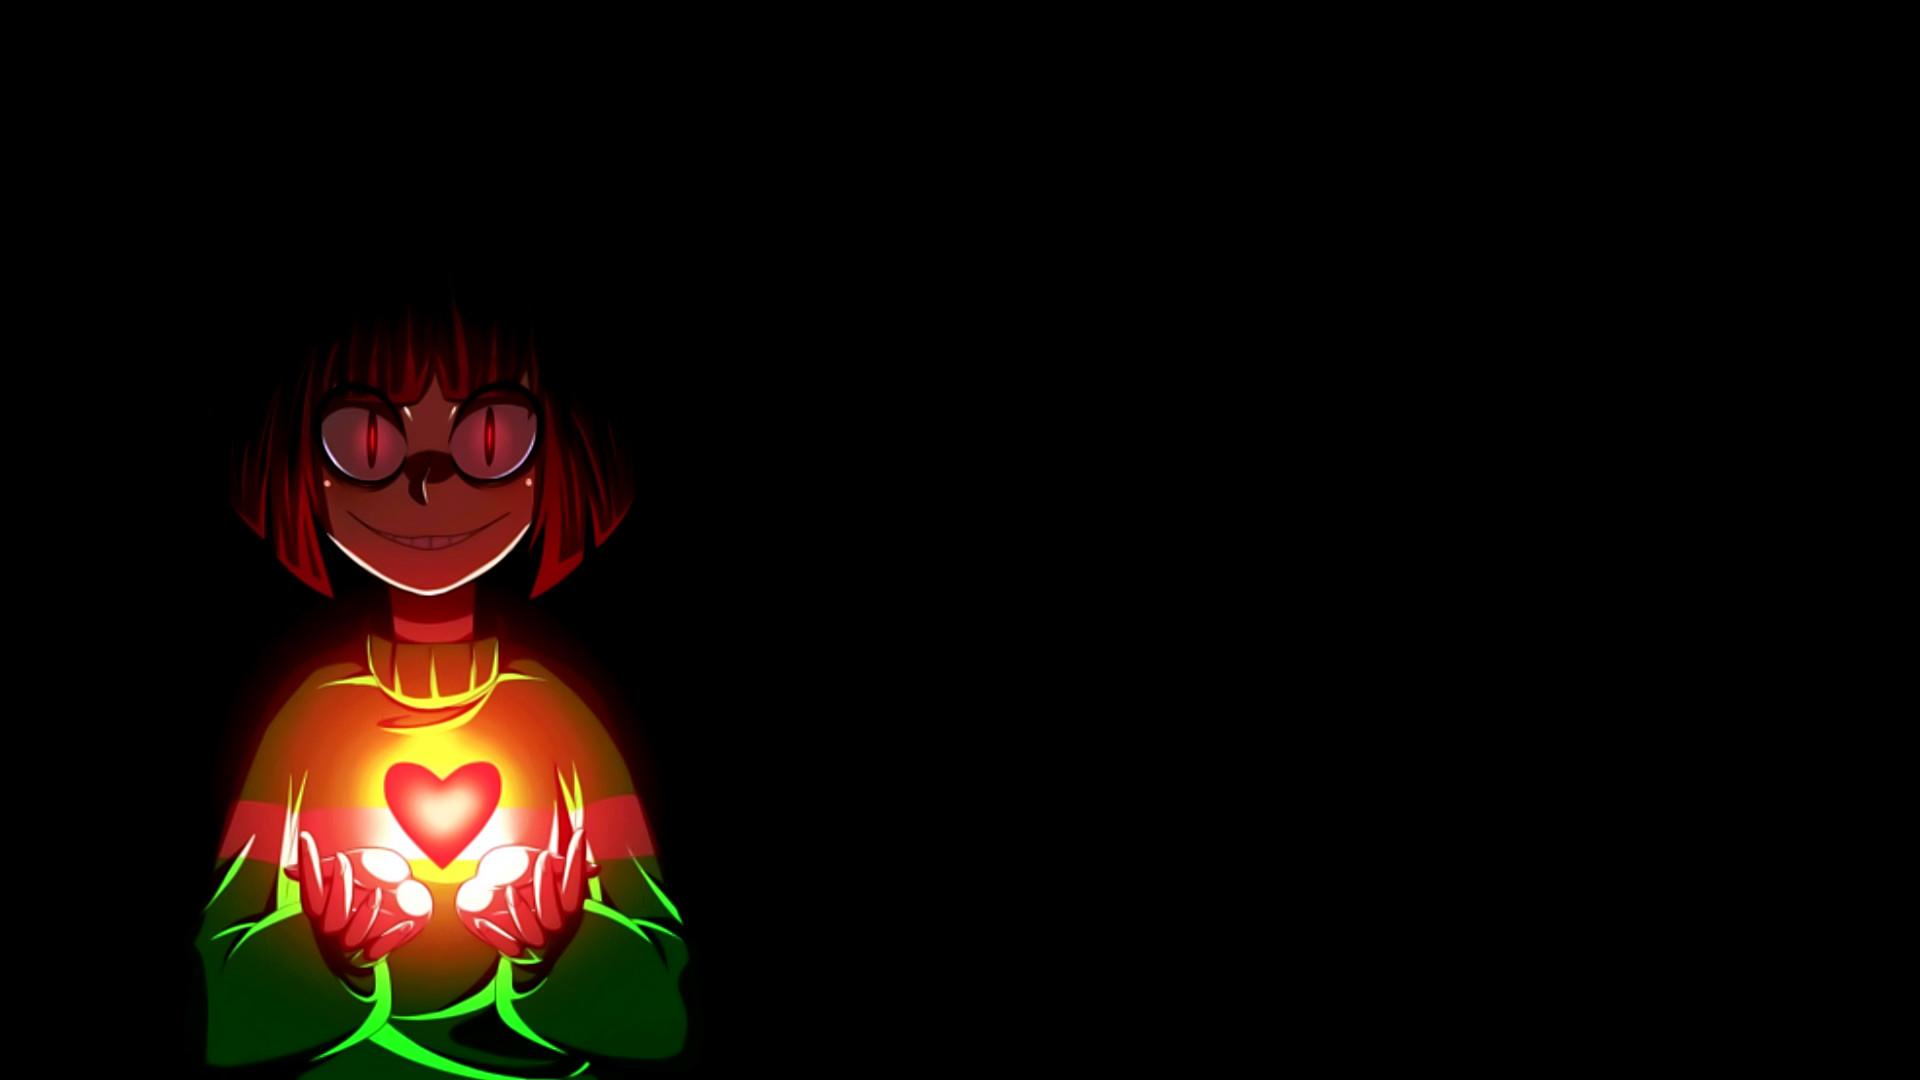 Video Game – Undertale Chara (Undertale) Wallpaper